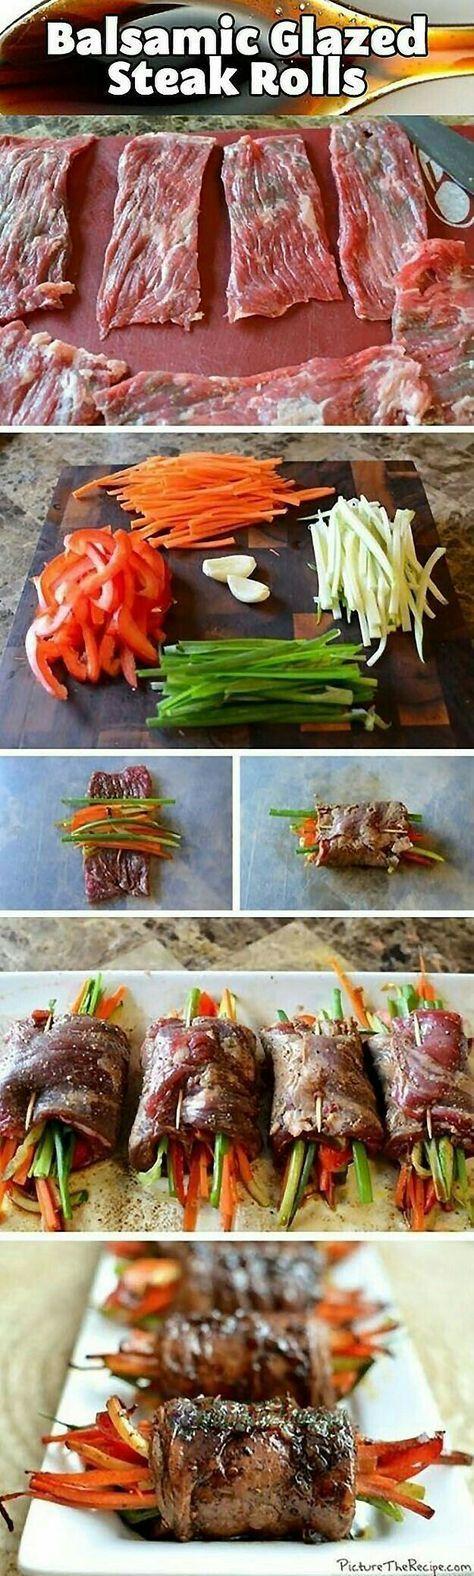 Beef and vegetable roll-ups (add enoki mushrooms)